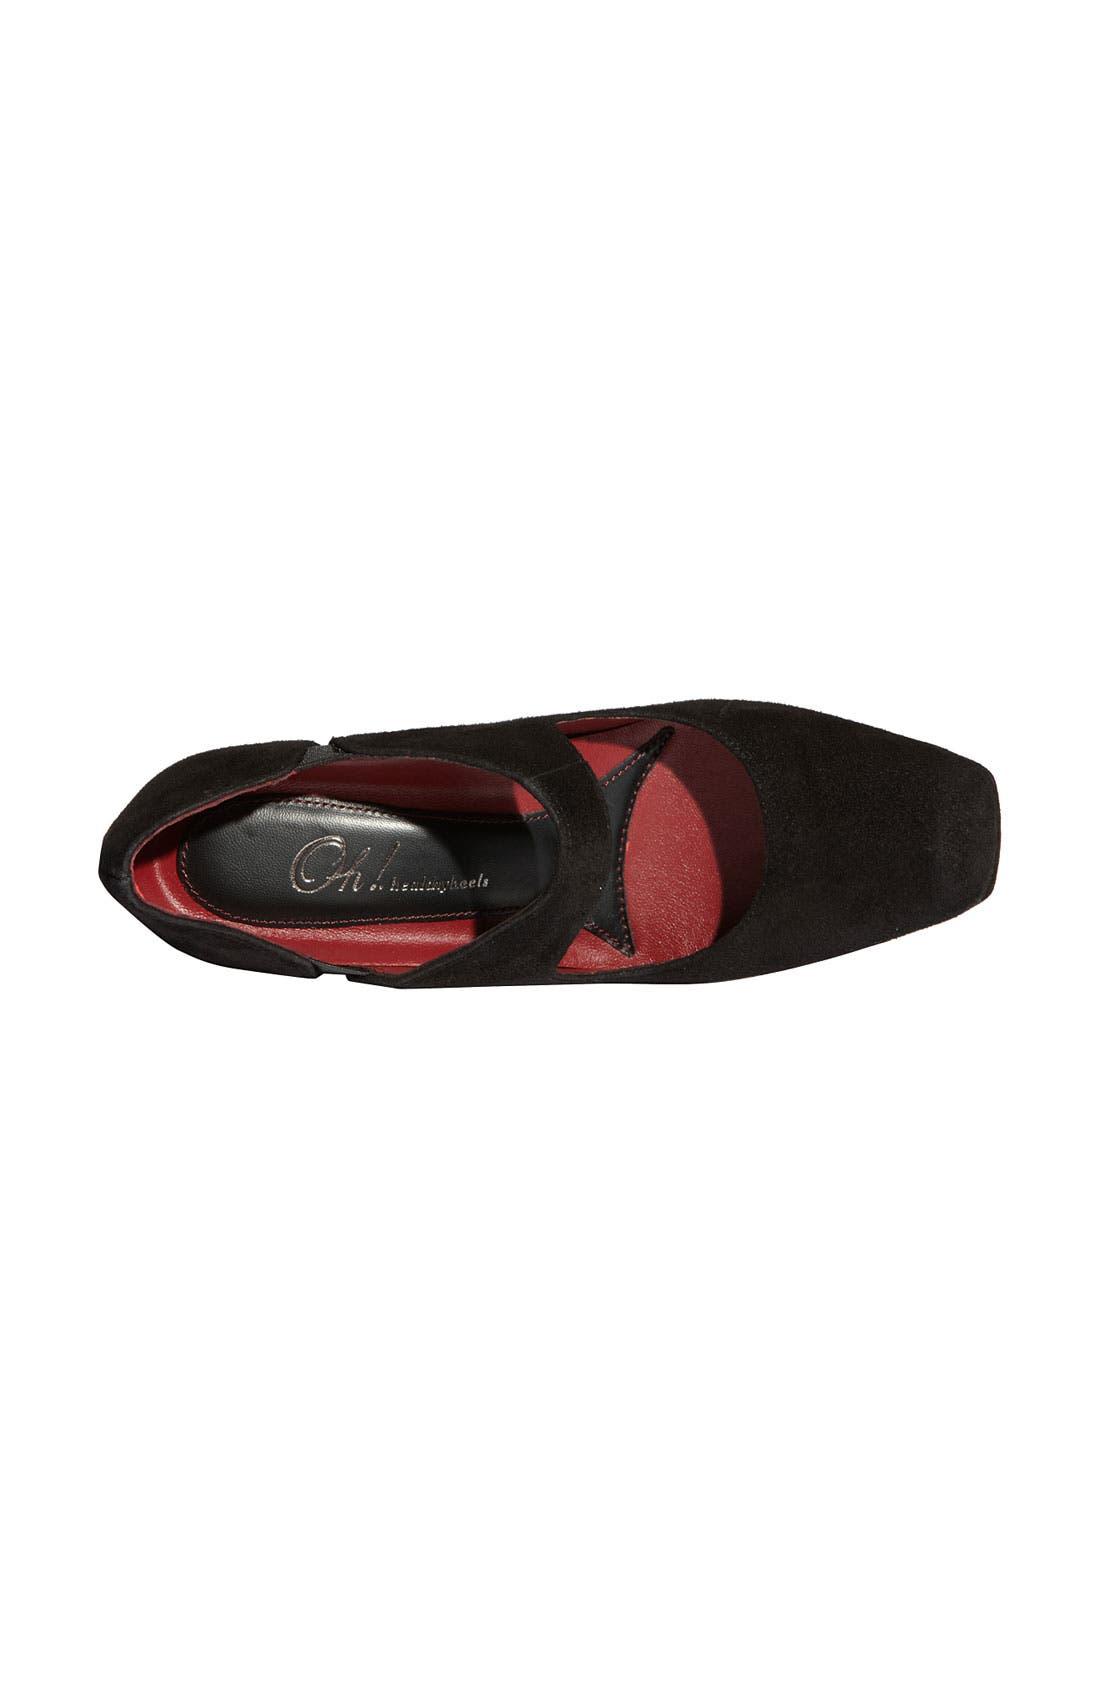 Alternate Image 3  - Oh! Shoes 'Tori' Mary Jane Pump